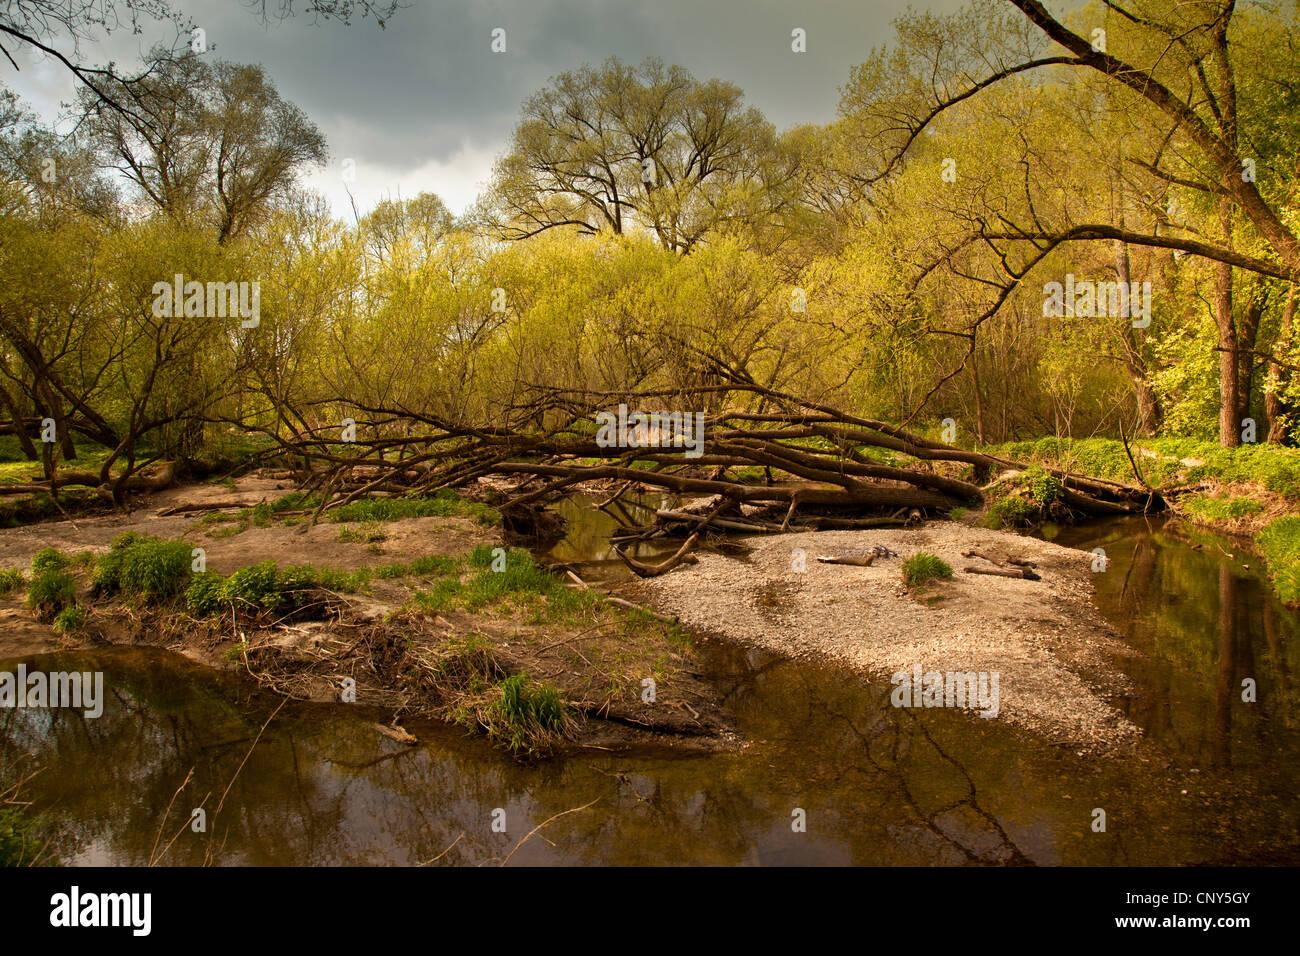 White willow (Salix alba), floodplain forest in spring, Germany, Bavaria, Isental - Stock Image